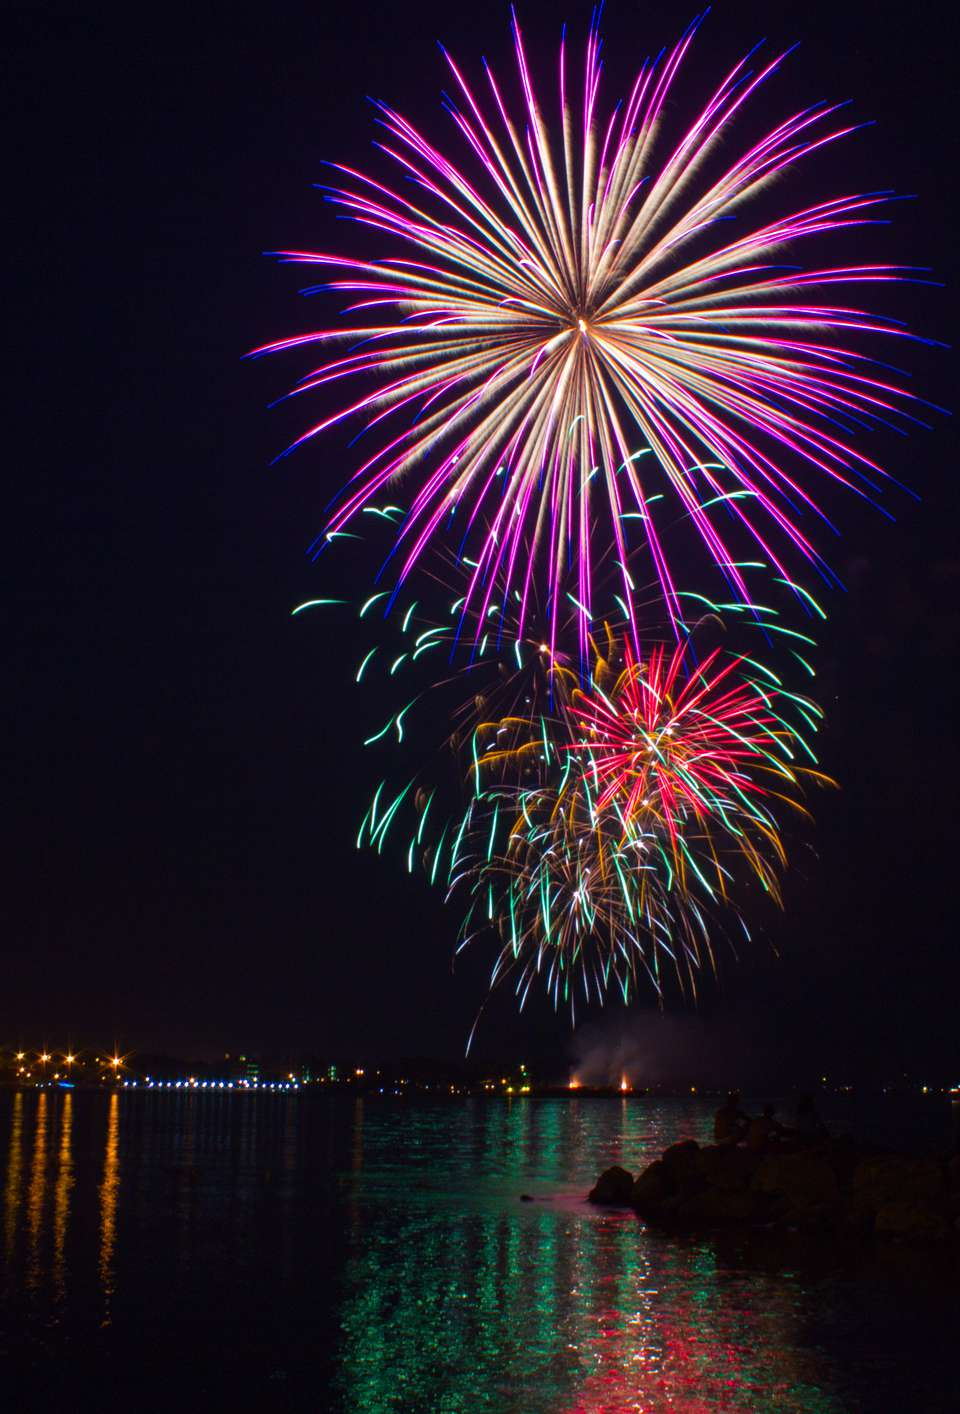 Fireworks over the York River